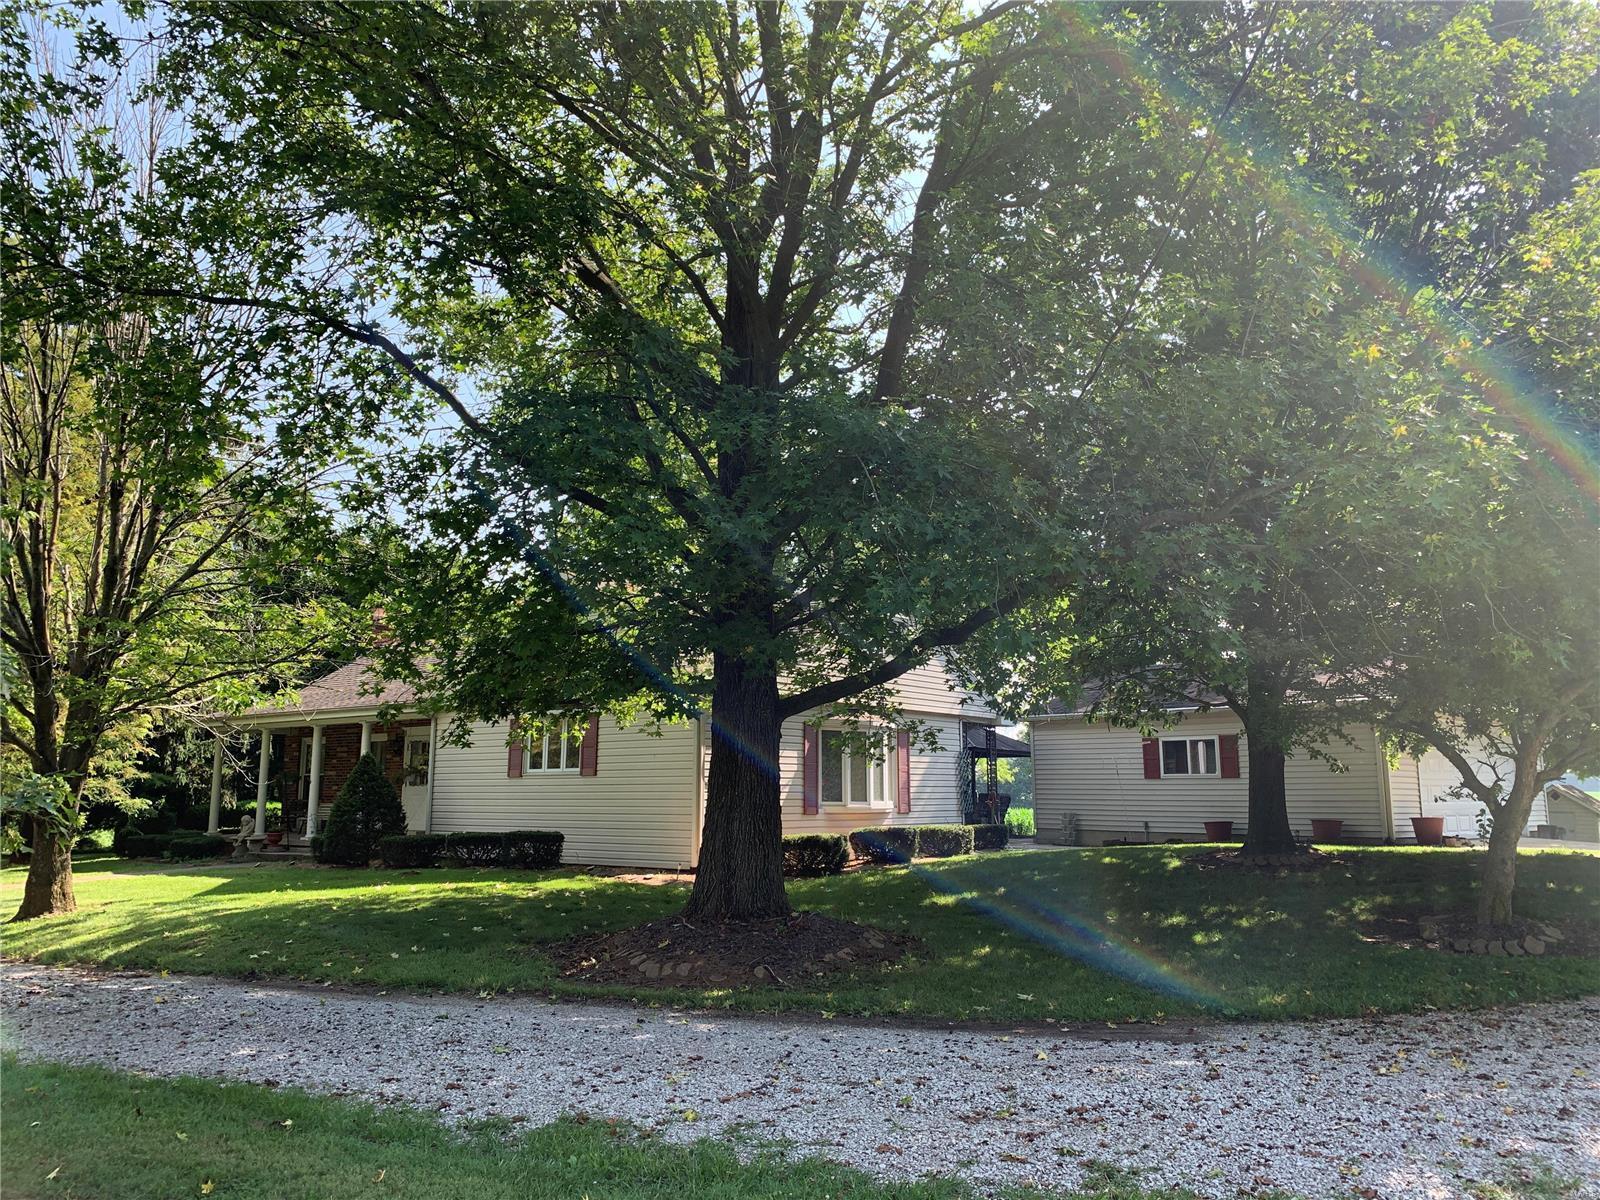 1084 N 150 Property Photo - Vandalia, IL real estate listing